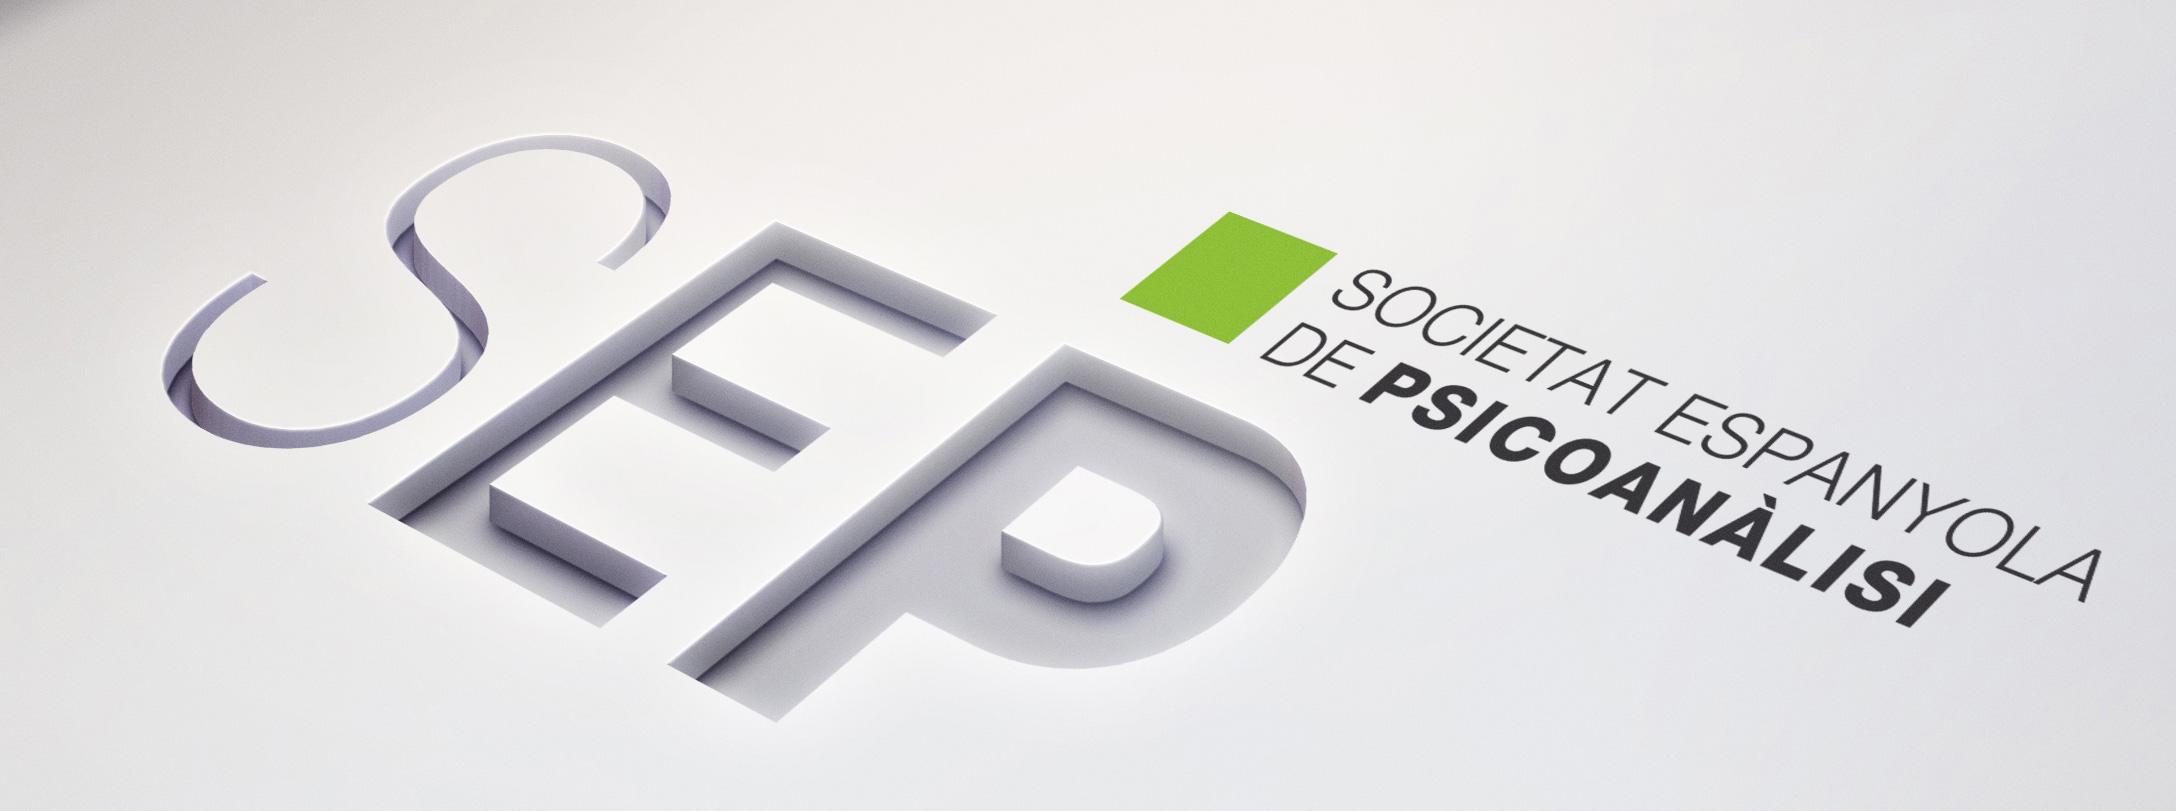 Societat Espanyola de Psicoanàlisi